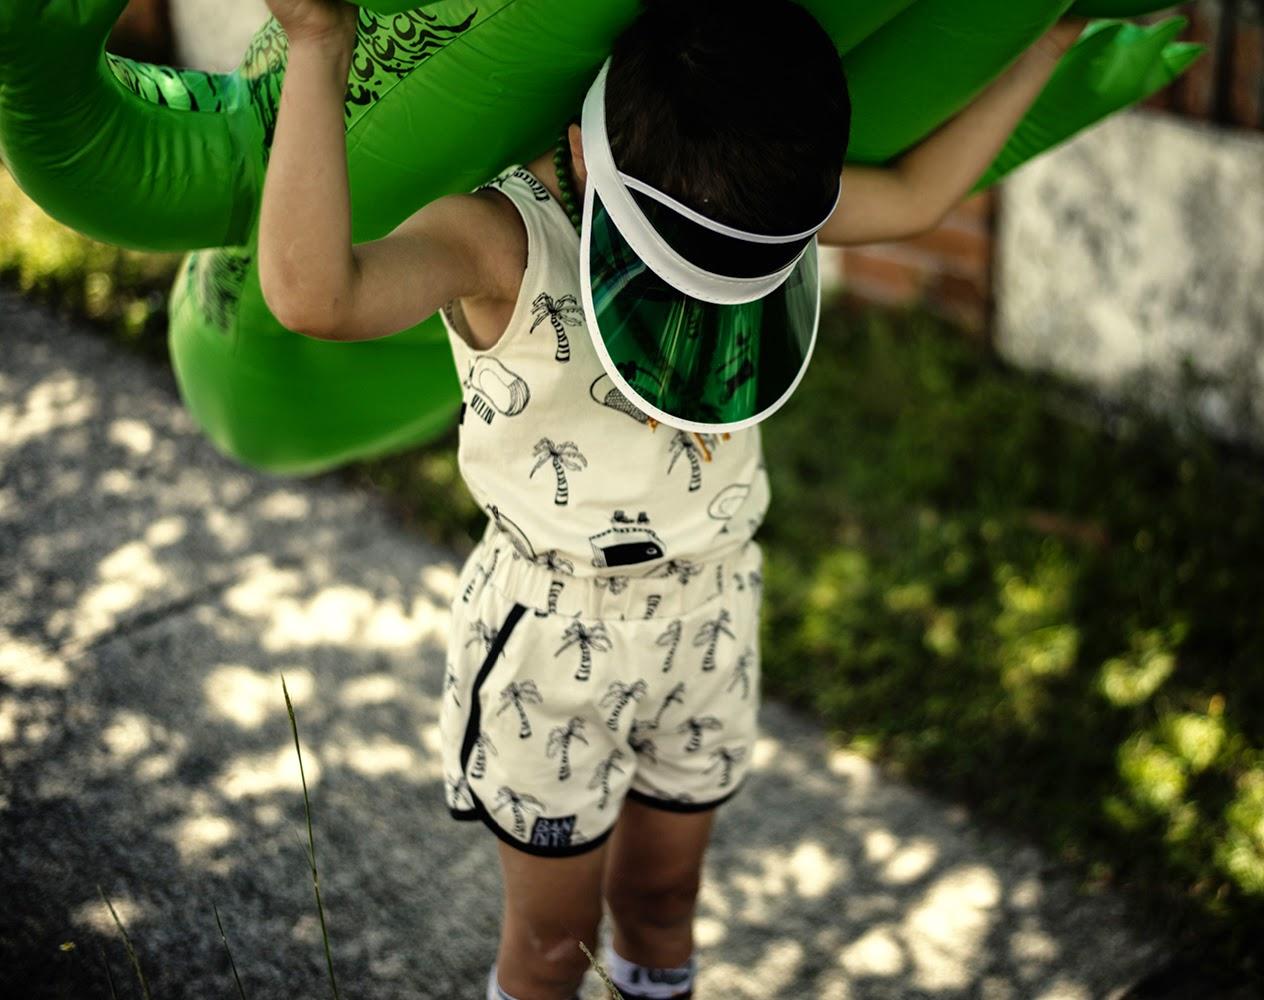 Bandit Kids SS15 preview 'Kingdom of Cool' Palm tree print